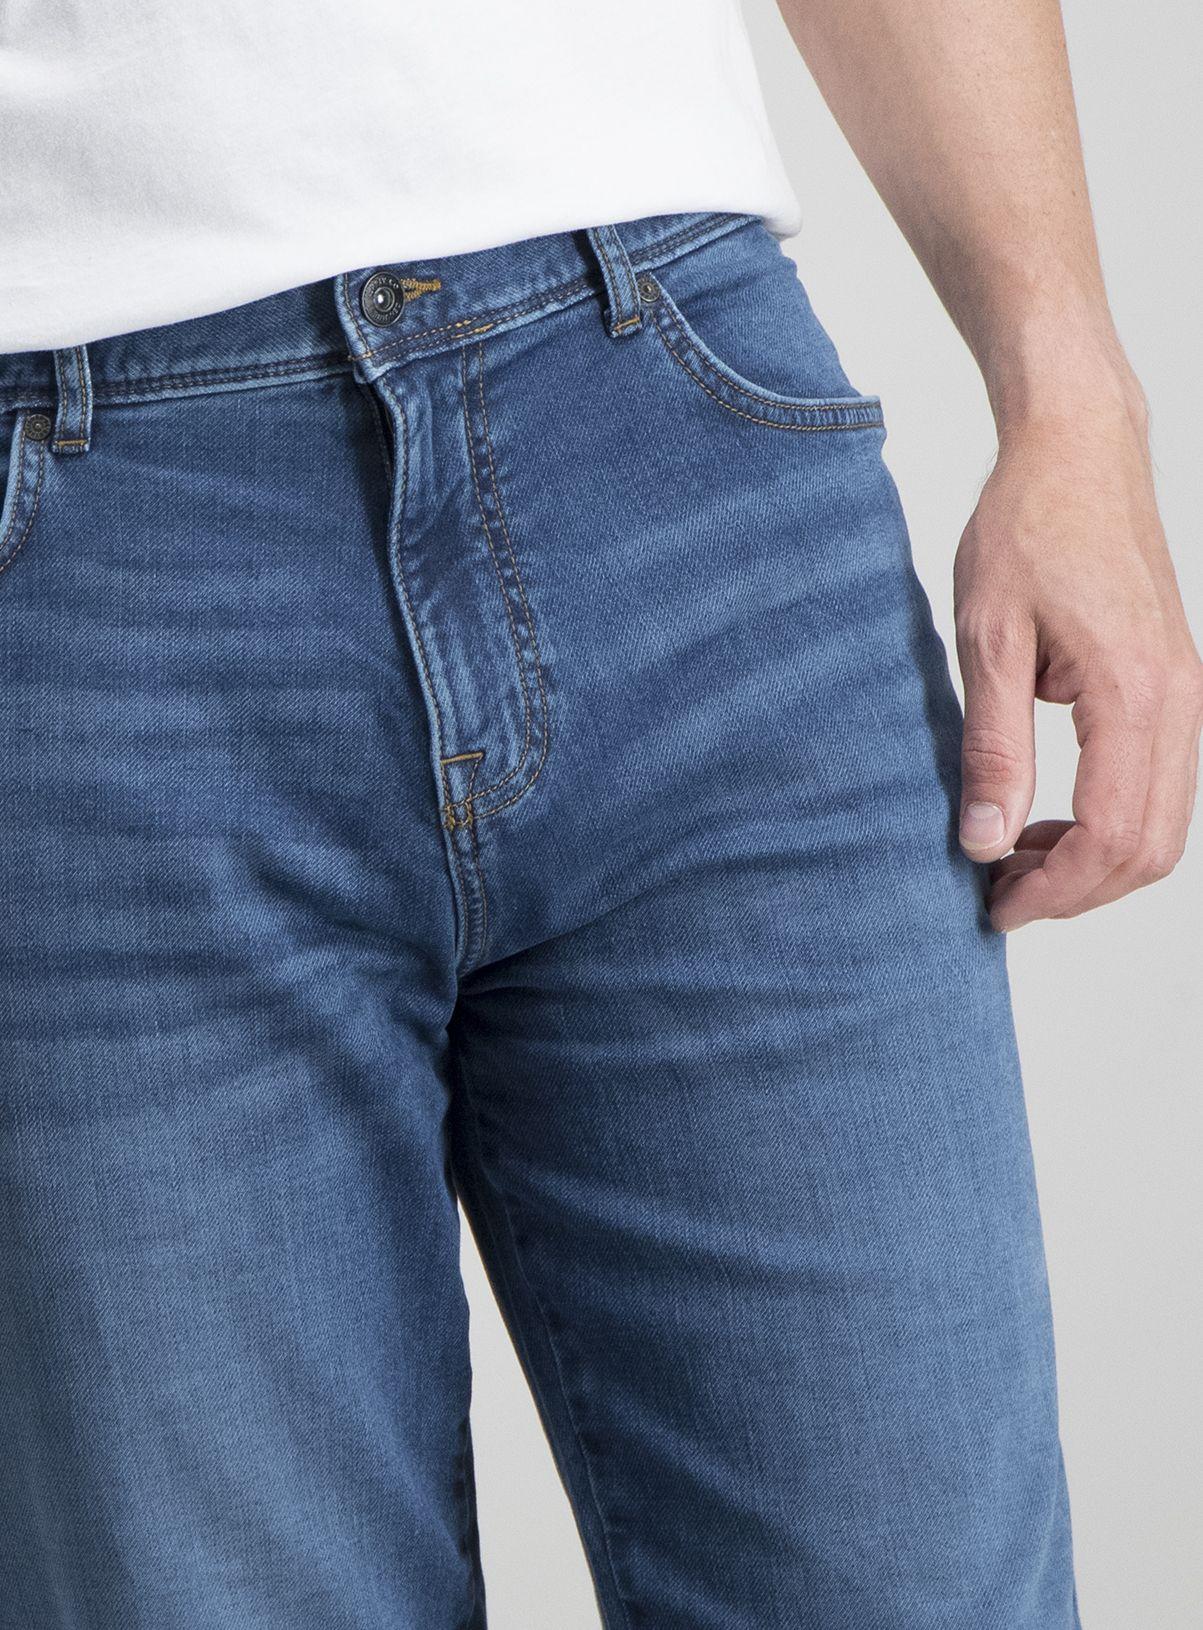 Men's Light Wash Denim Straight Fit Ultimate Comfort Jeans